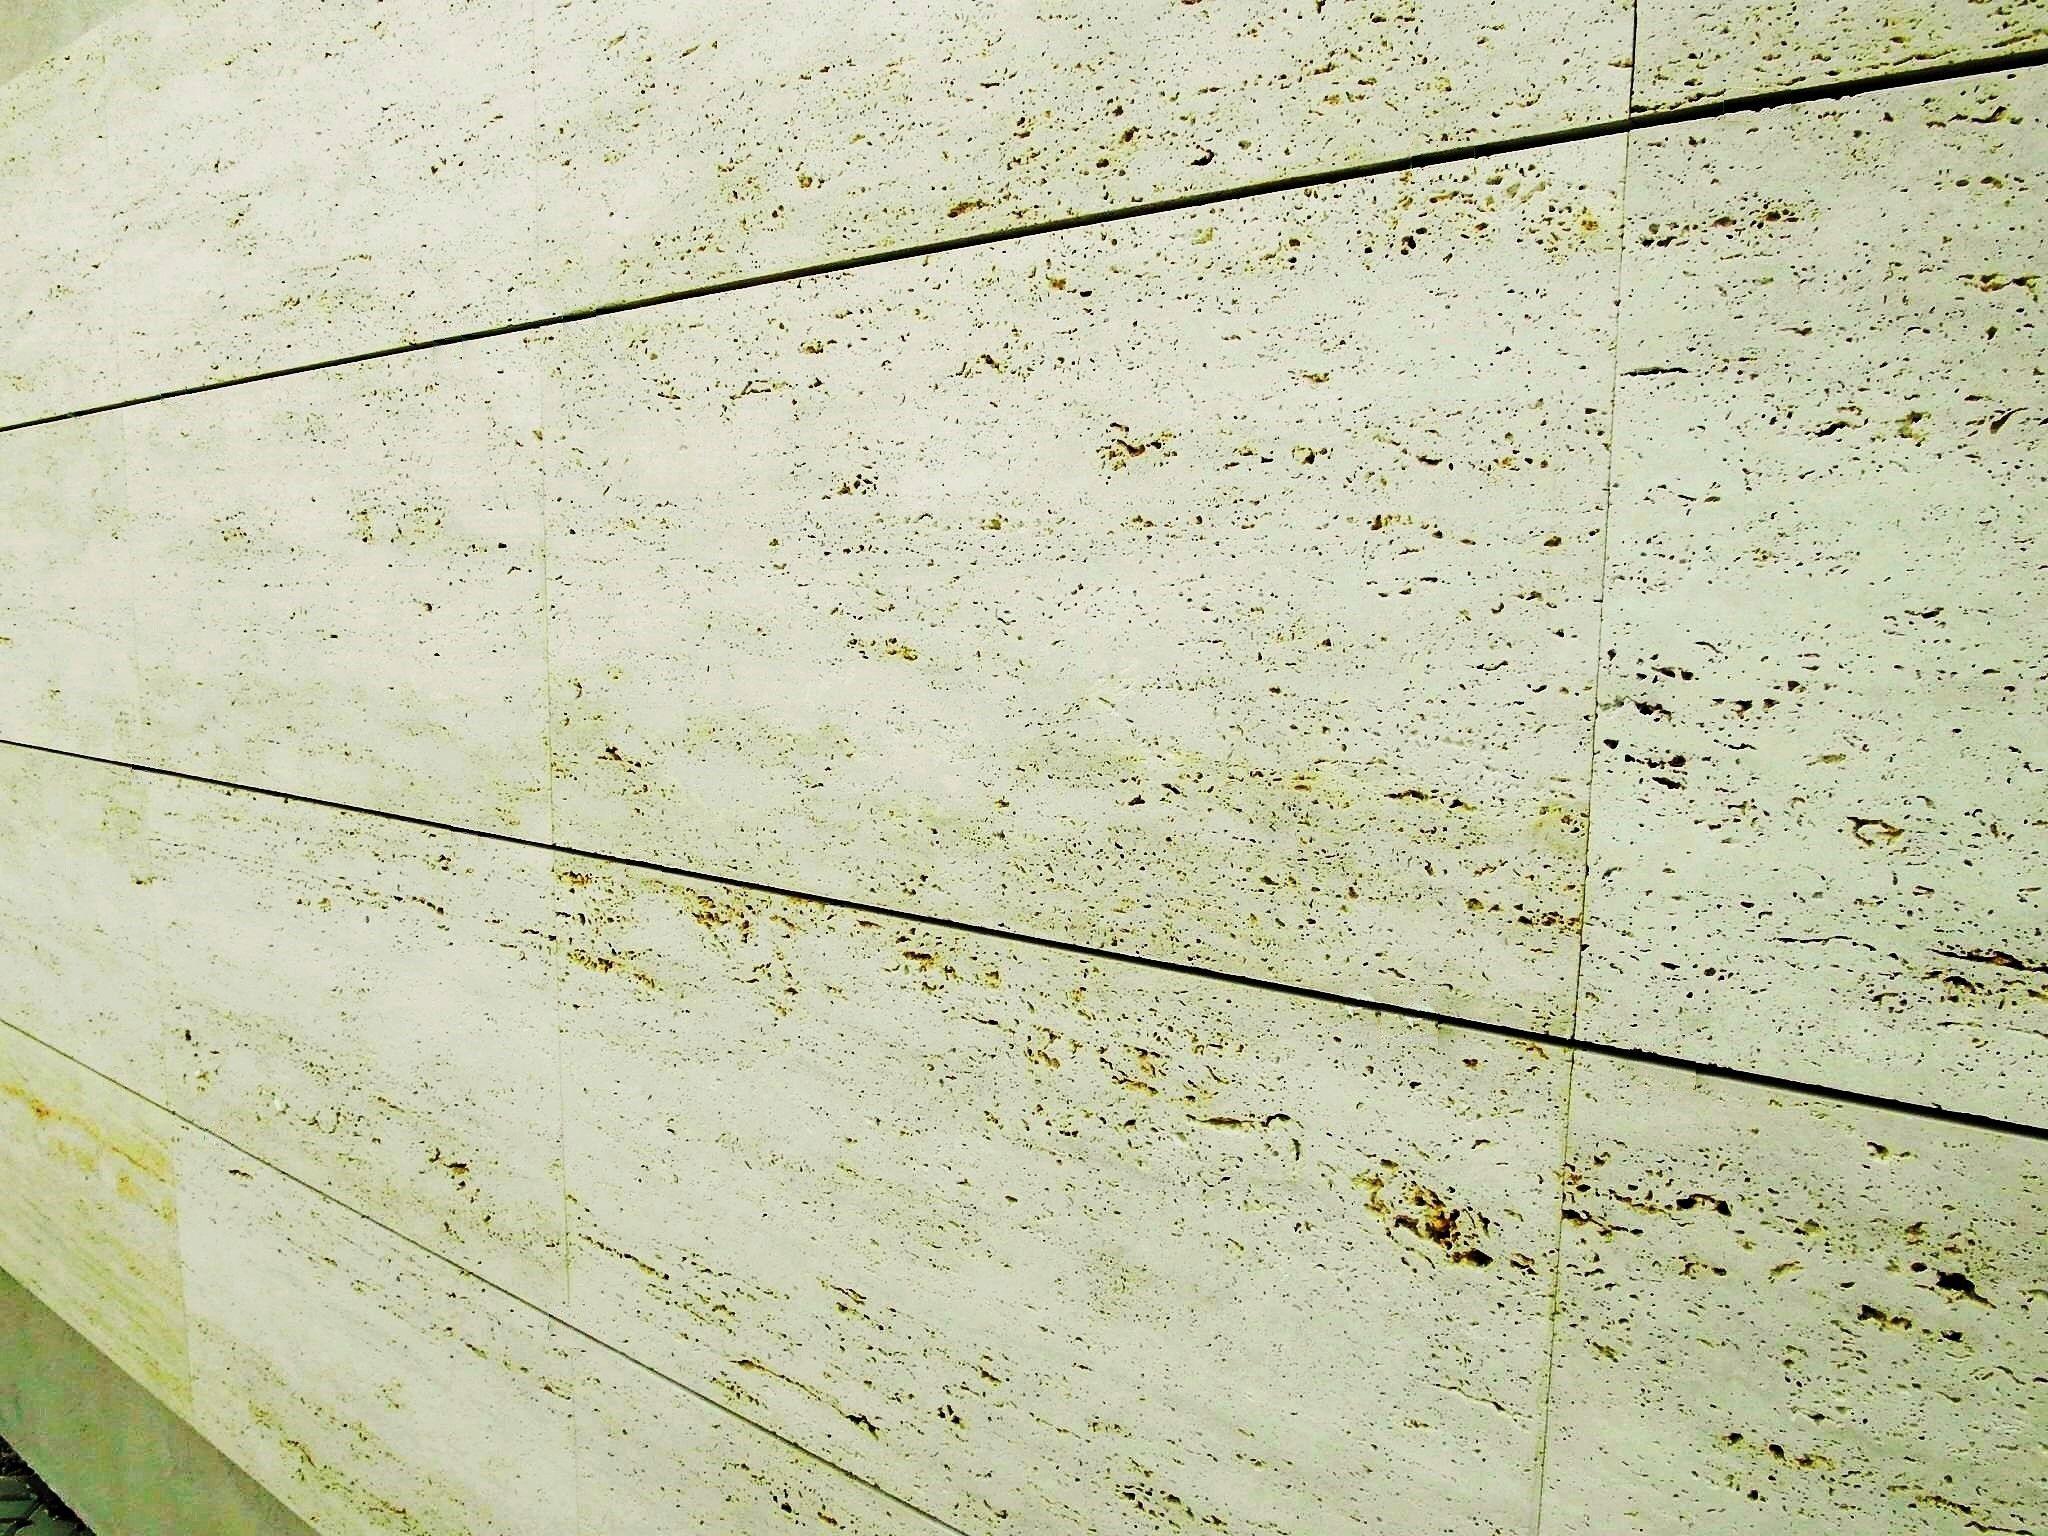 Acabado exterior en marmol travertino casas de acero y for Marmol travertino nacional